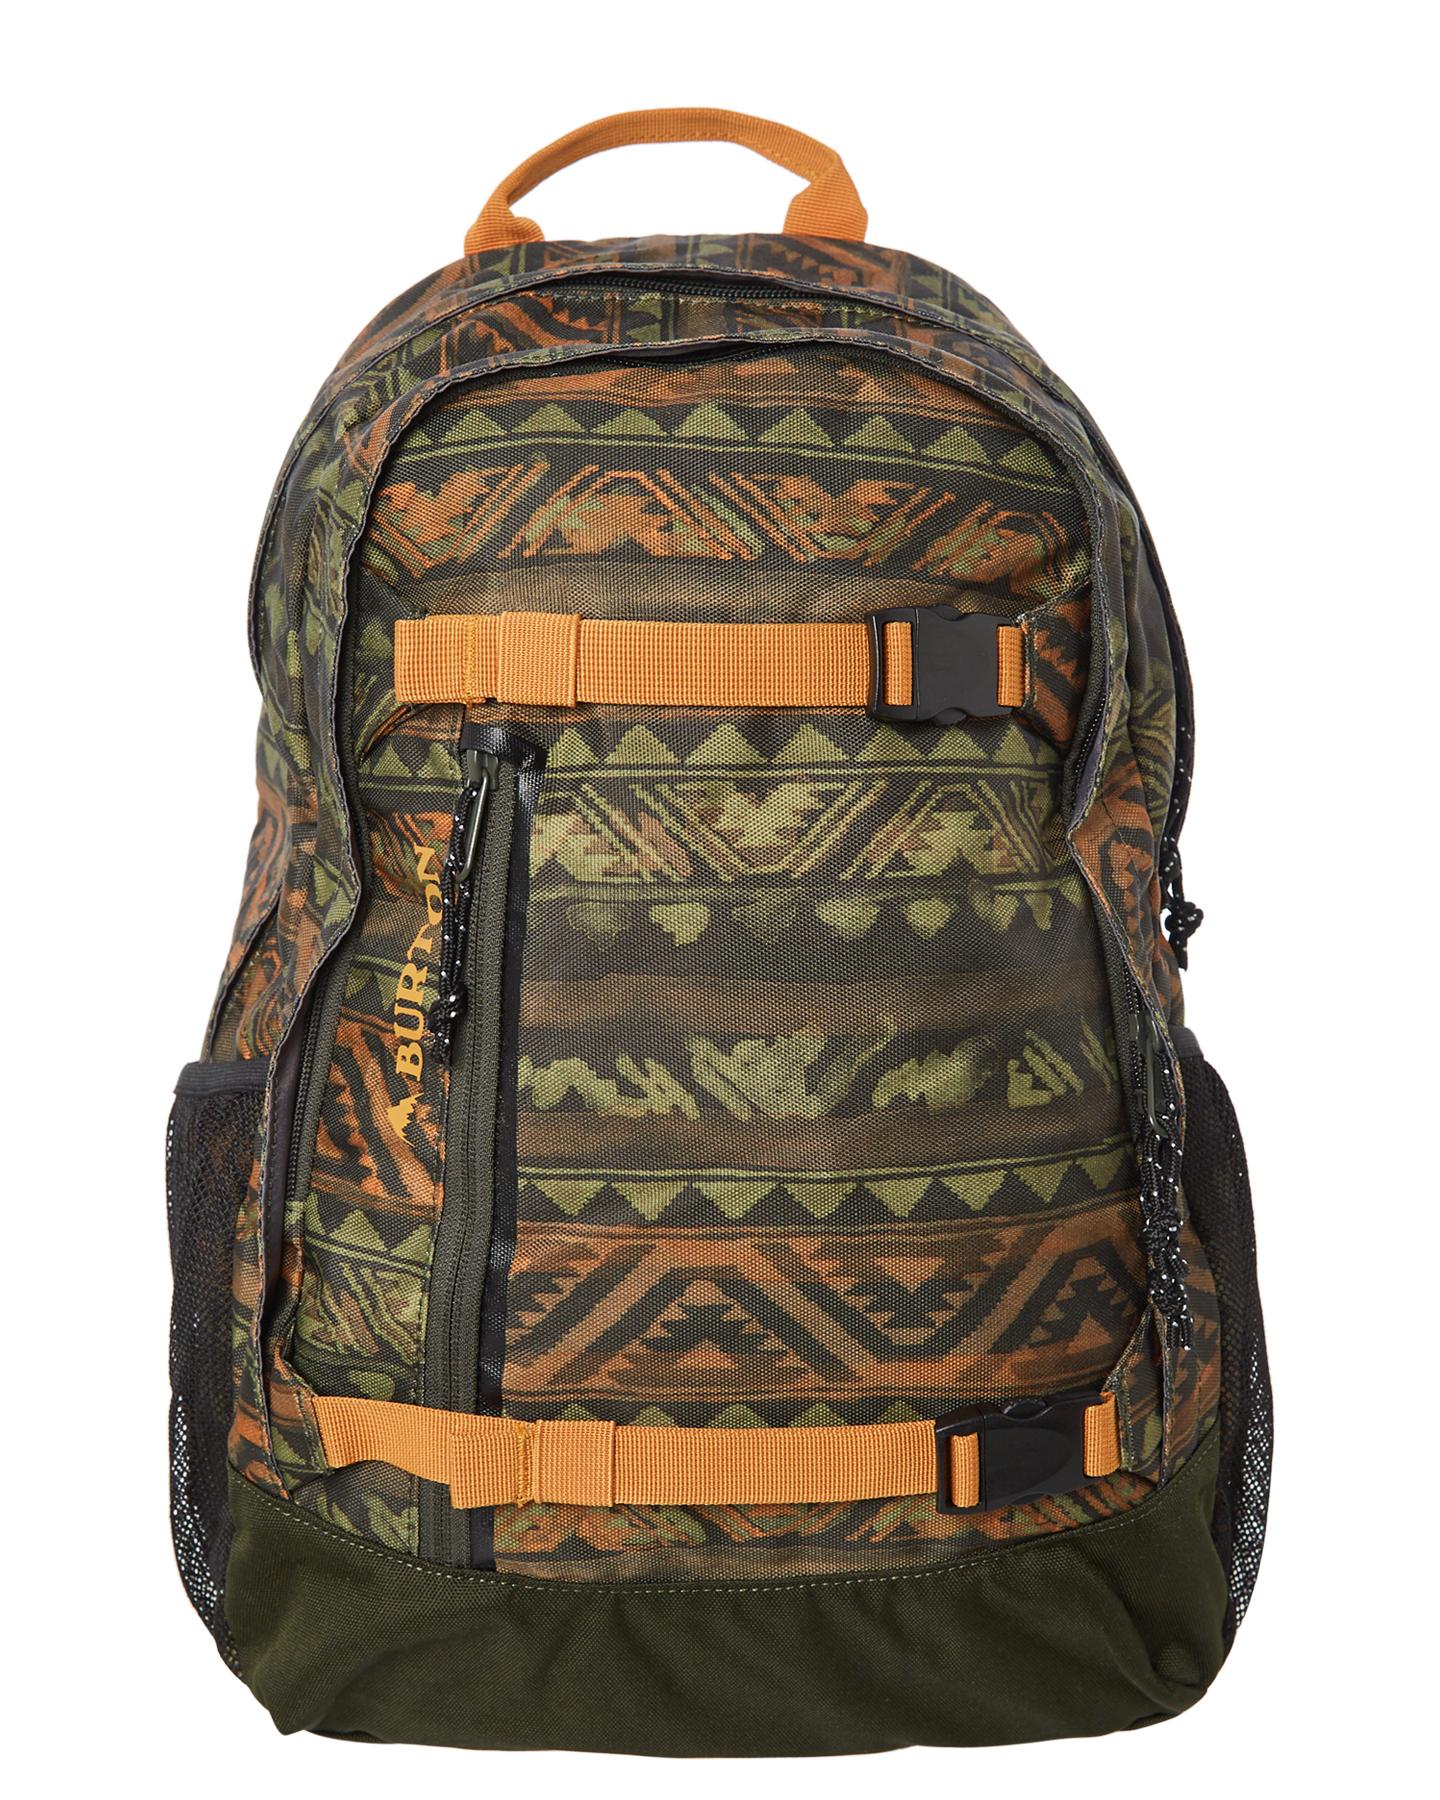 cb780e30b8e2 Burton Kids Youth Day Hiker 20L Backpack - Resin Chimayo Remix ...